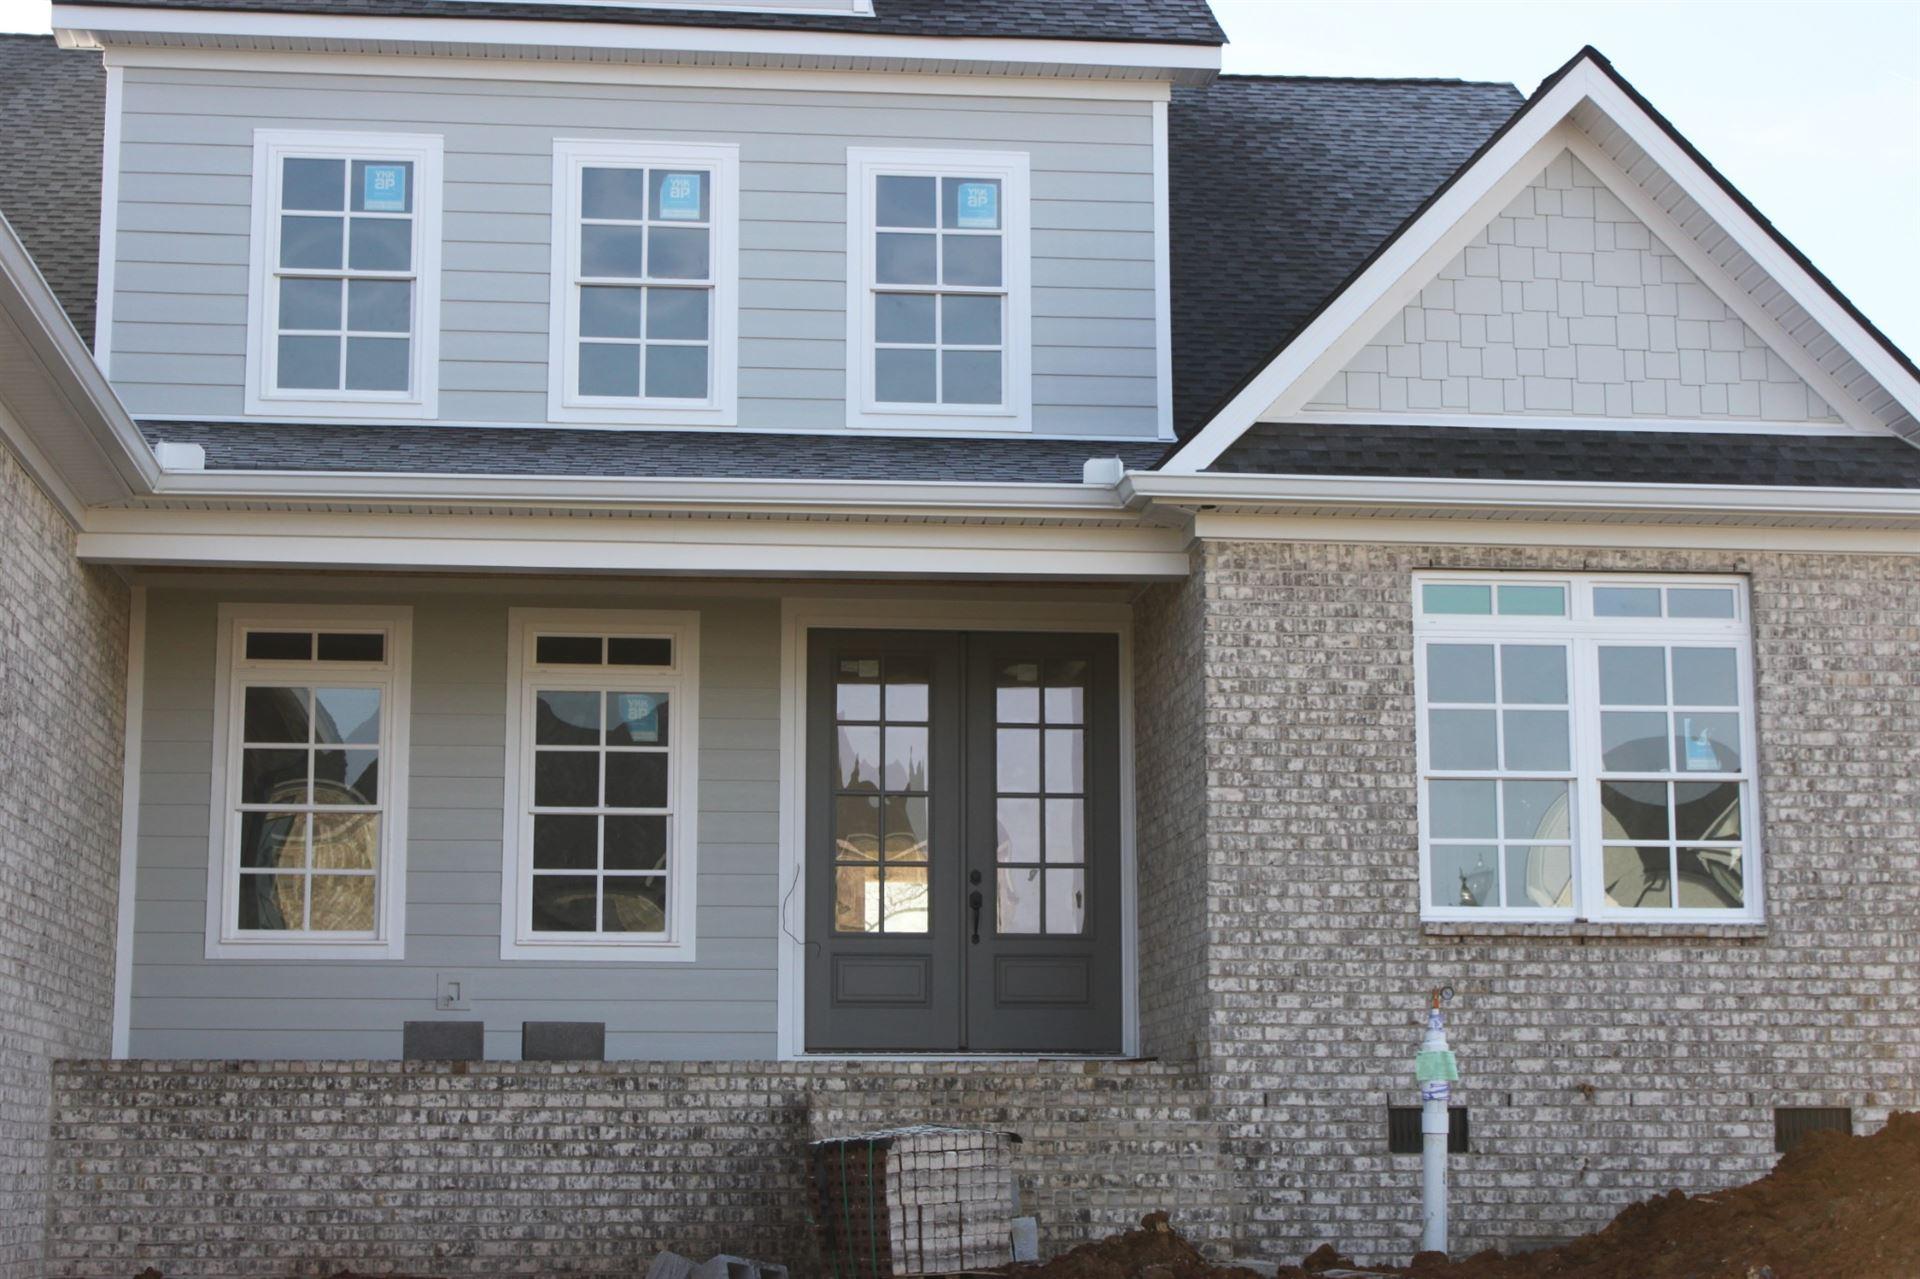 5607 Bridgemore Blvd, Murfreesboro, TN 37129 - MLS#: 2174572